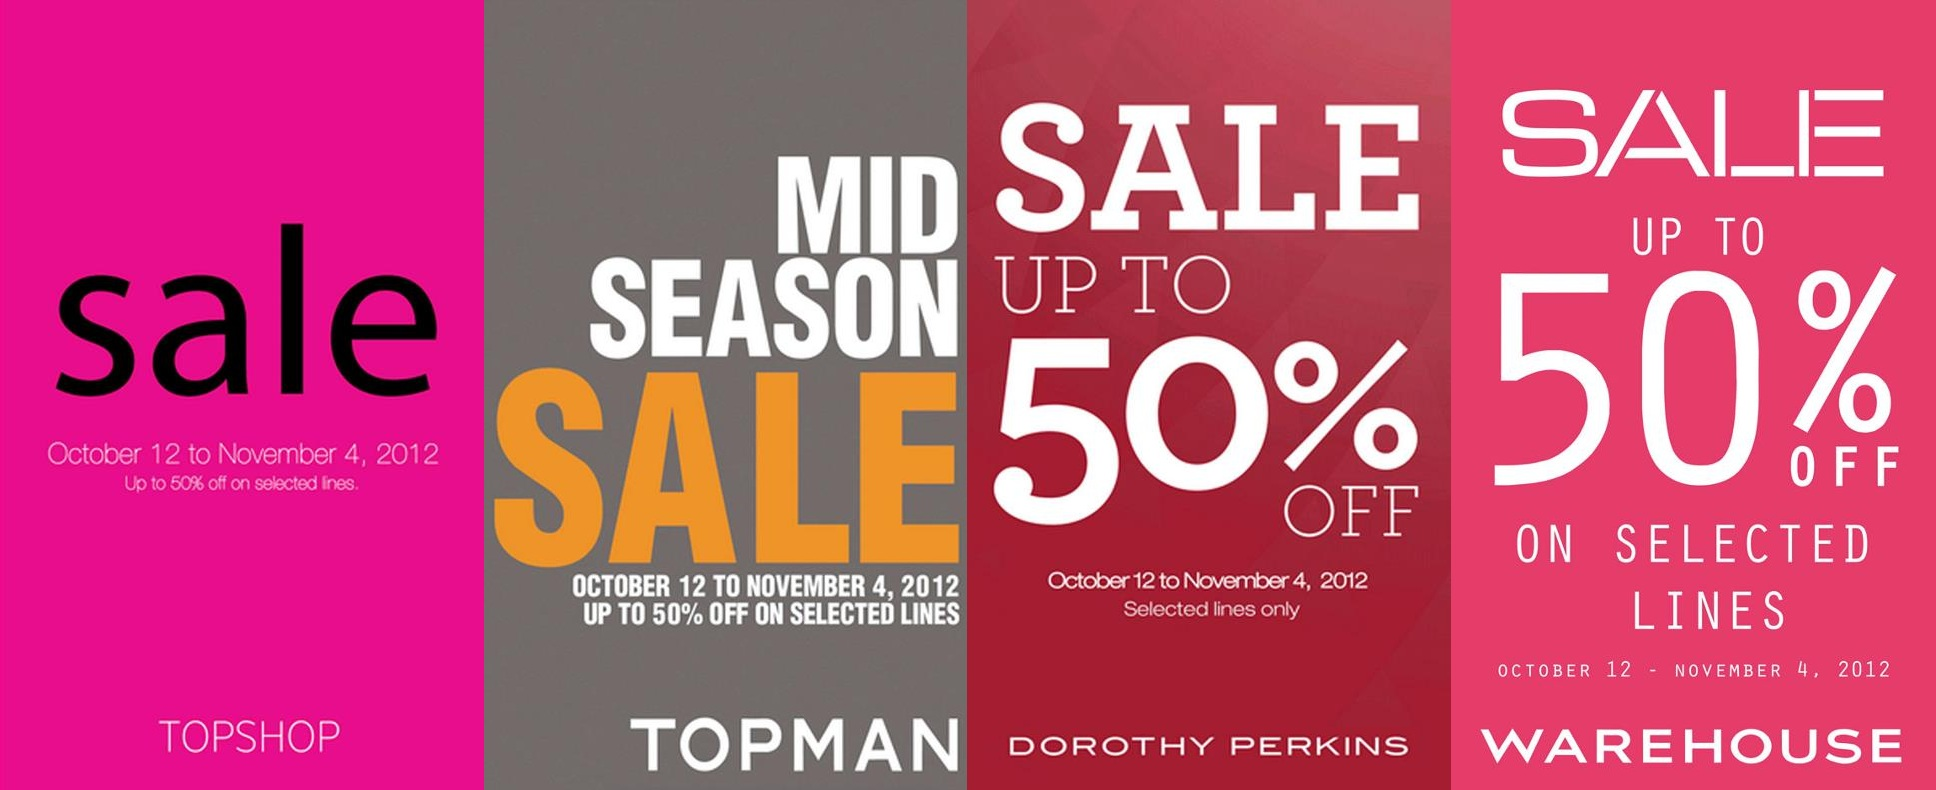 Topshop, Topman, Dorothy Perkins, Warehouse Mid-Season Sale October - November 2012